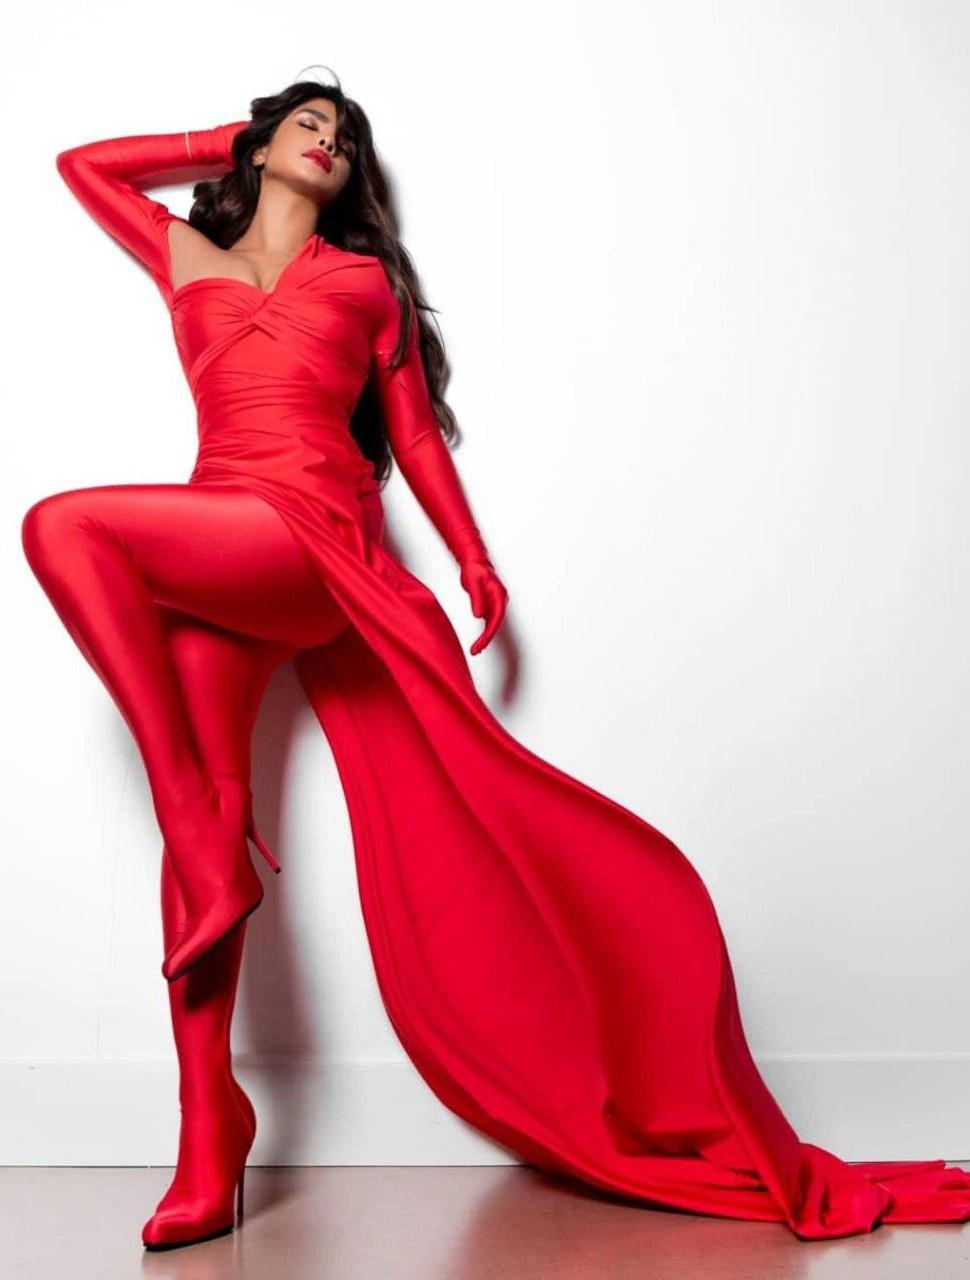 Priyanka Chopra Jonas latest photoshoot